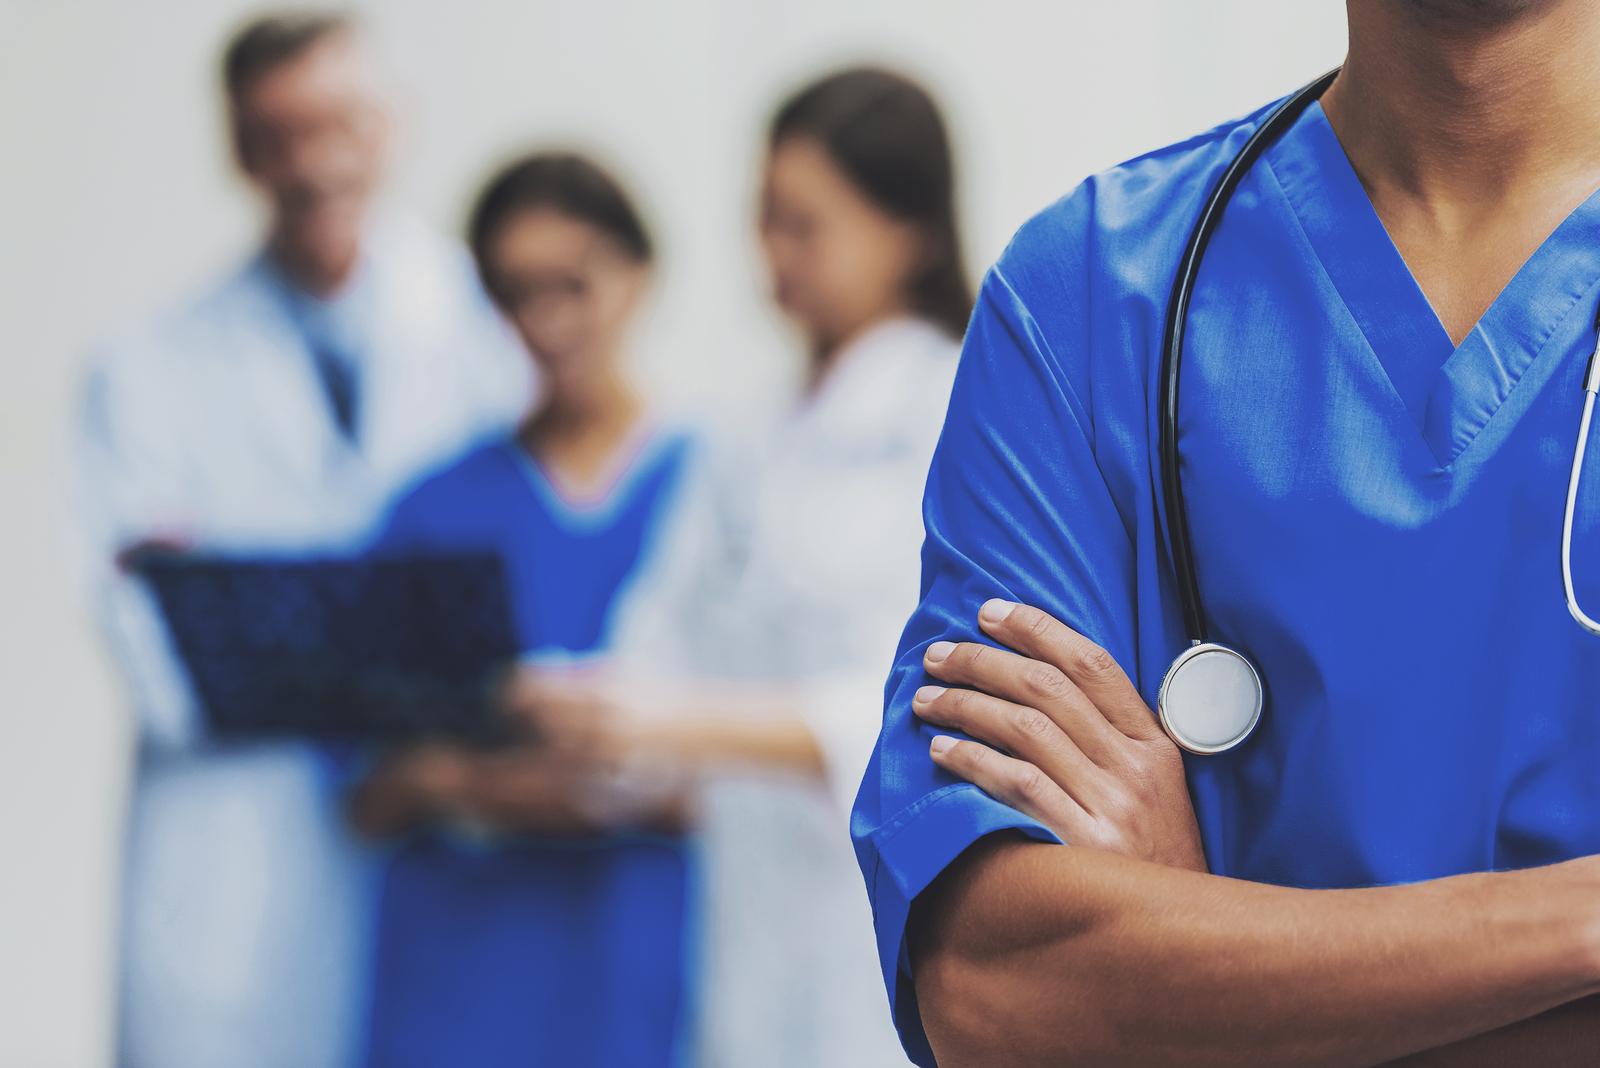 De reumatoloog en de PAH-patiënt